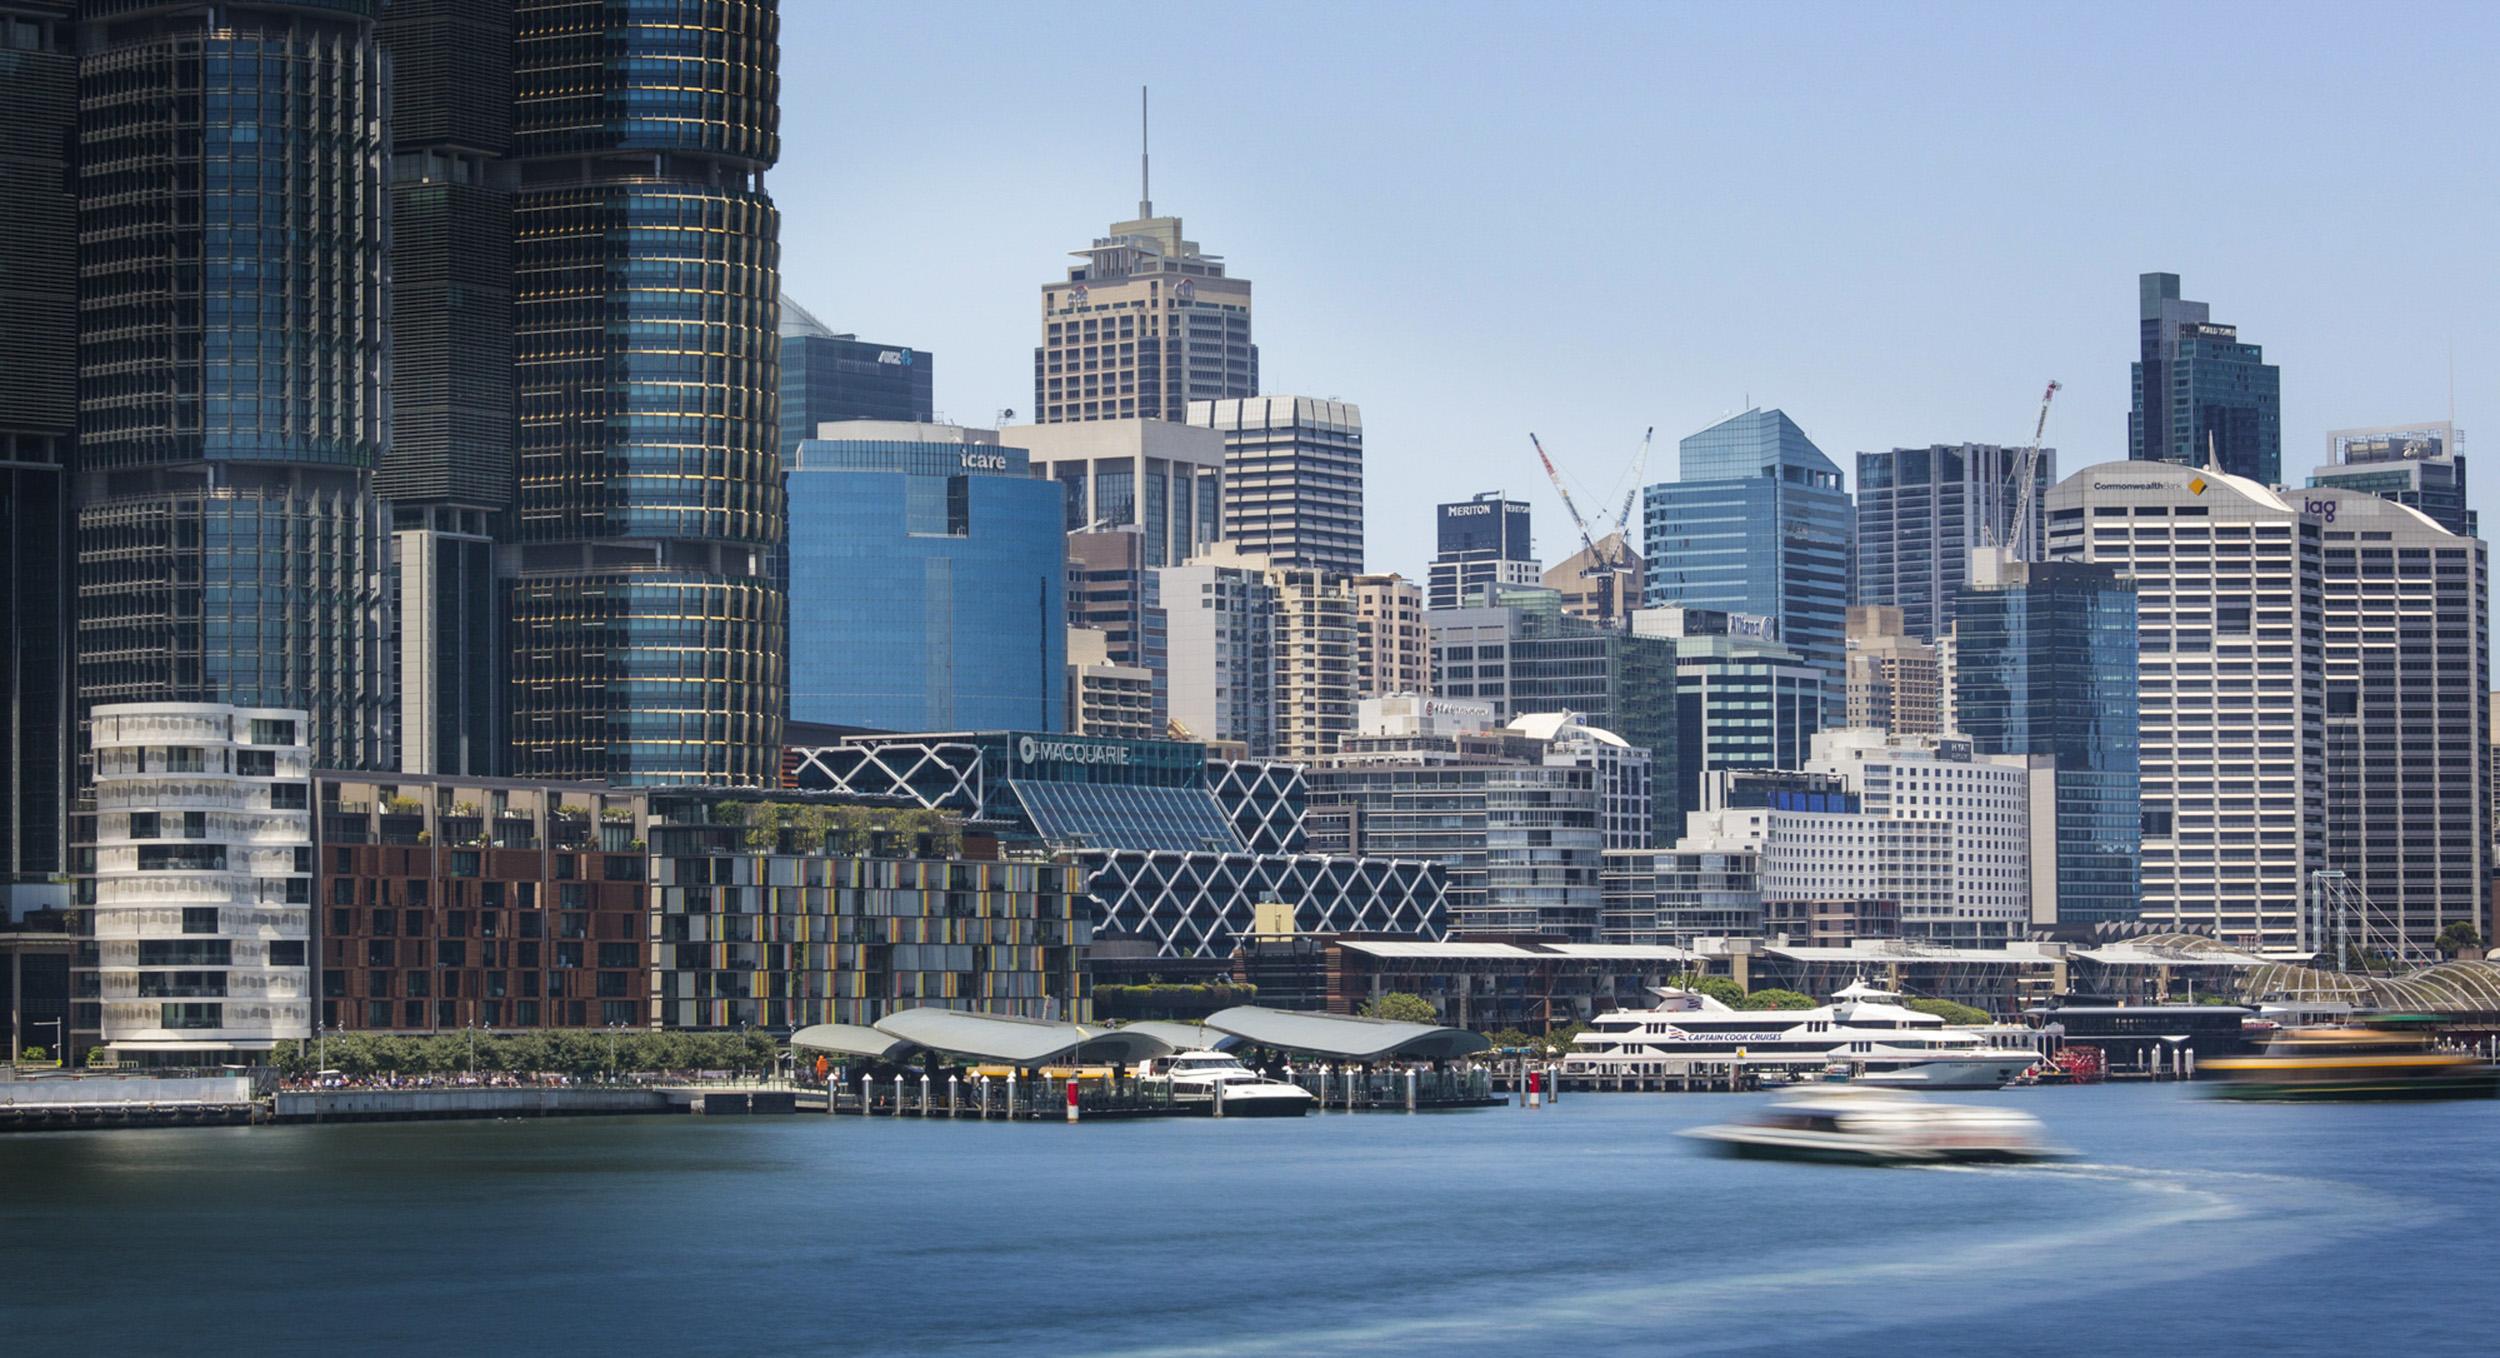 Barangaroo_wharf_cox_architecture_sydney_01.jpg